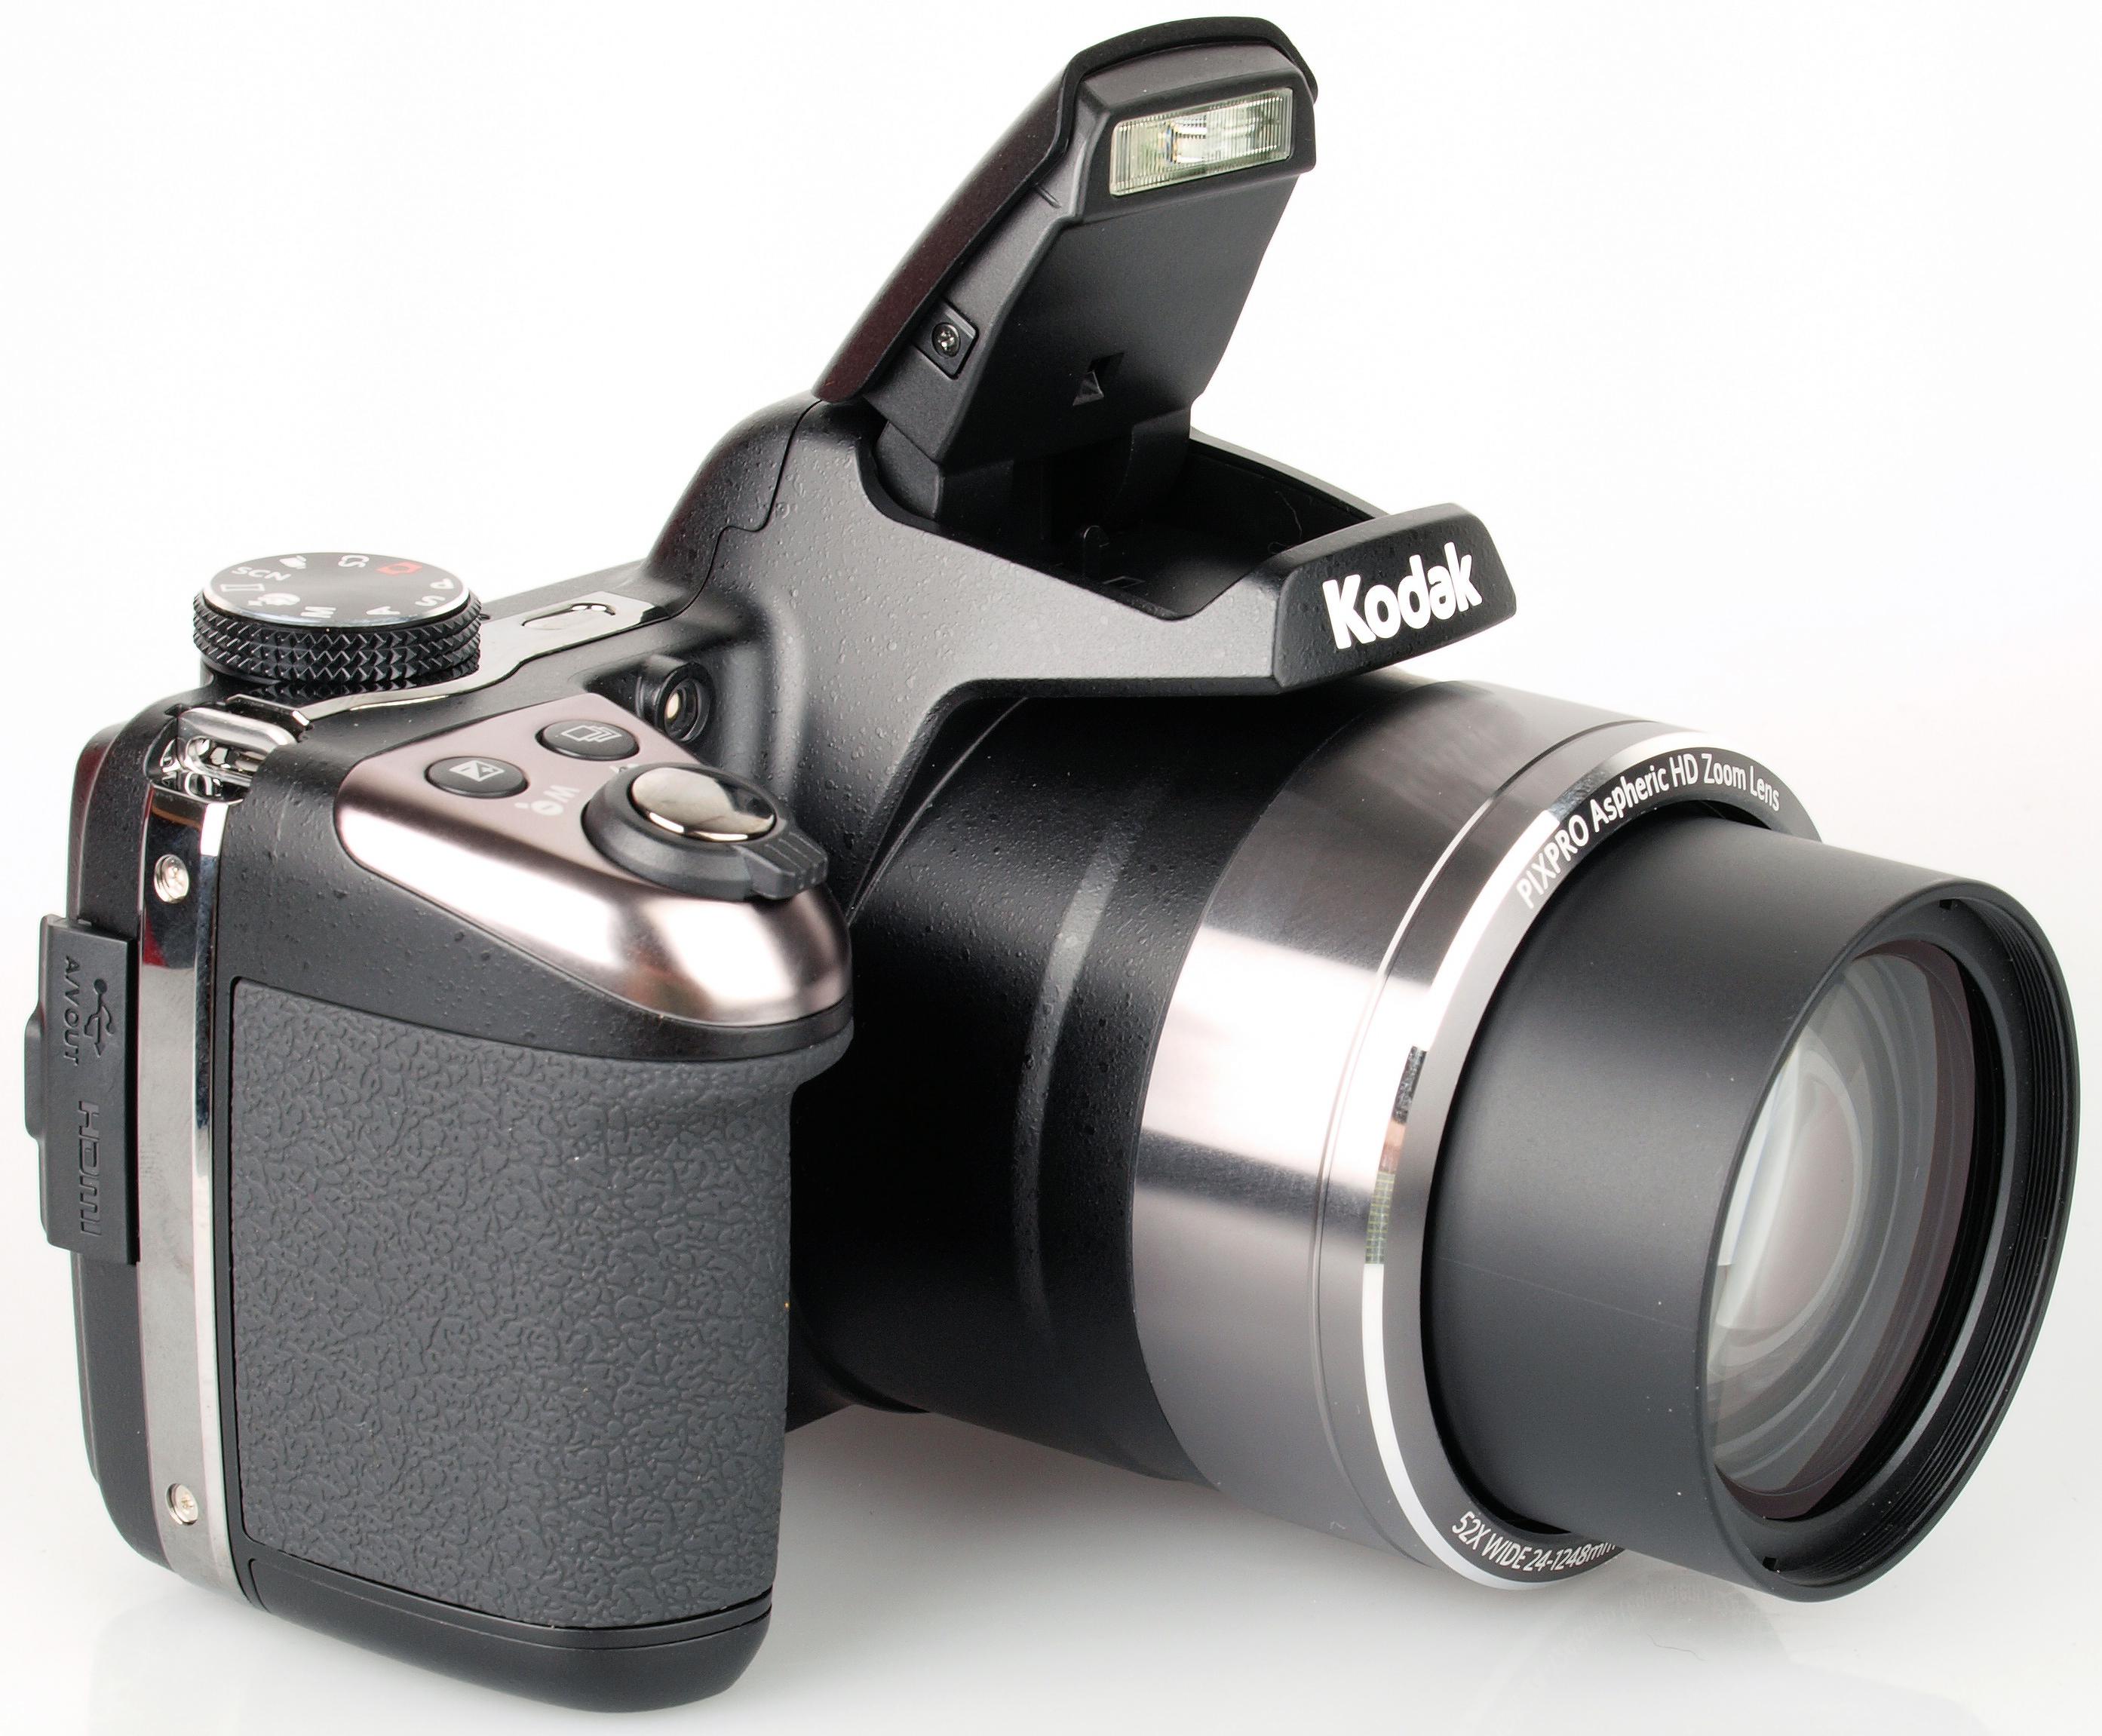 Kodak PIXPRO AZ521 Bridge Camera Review | ePHOTOzine